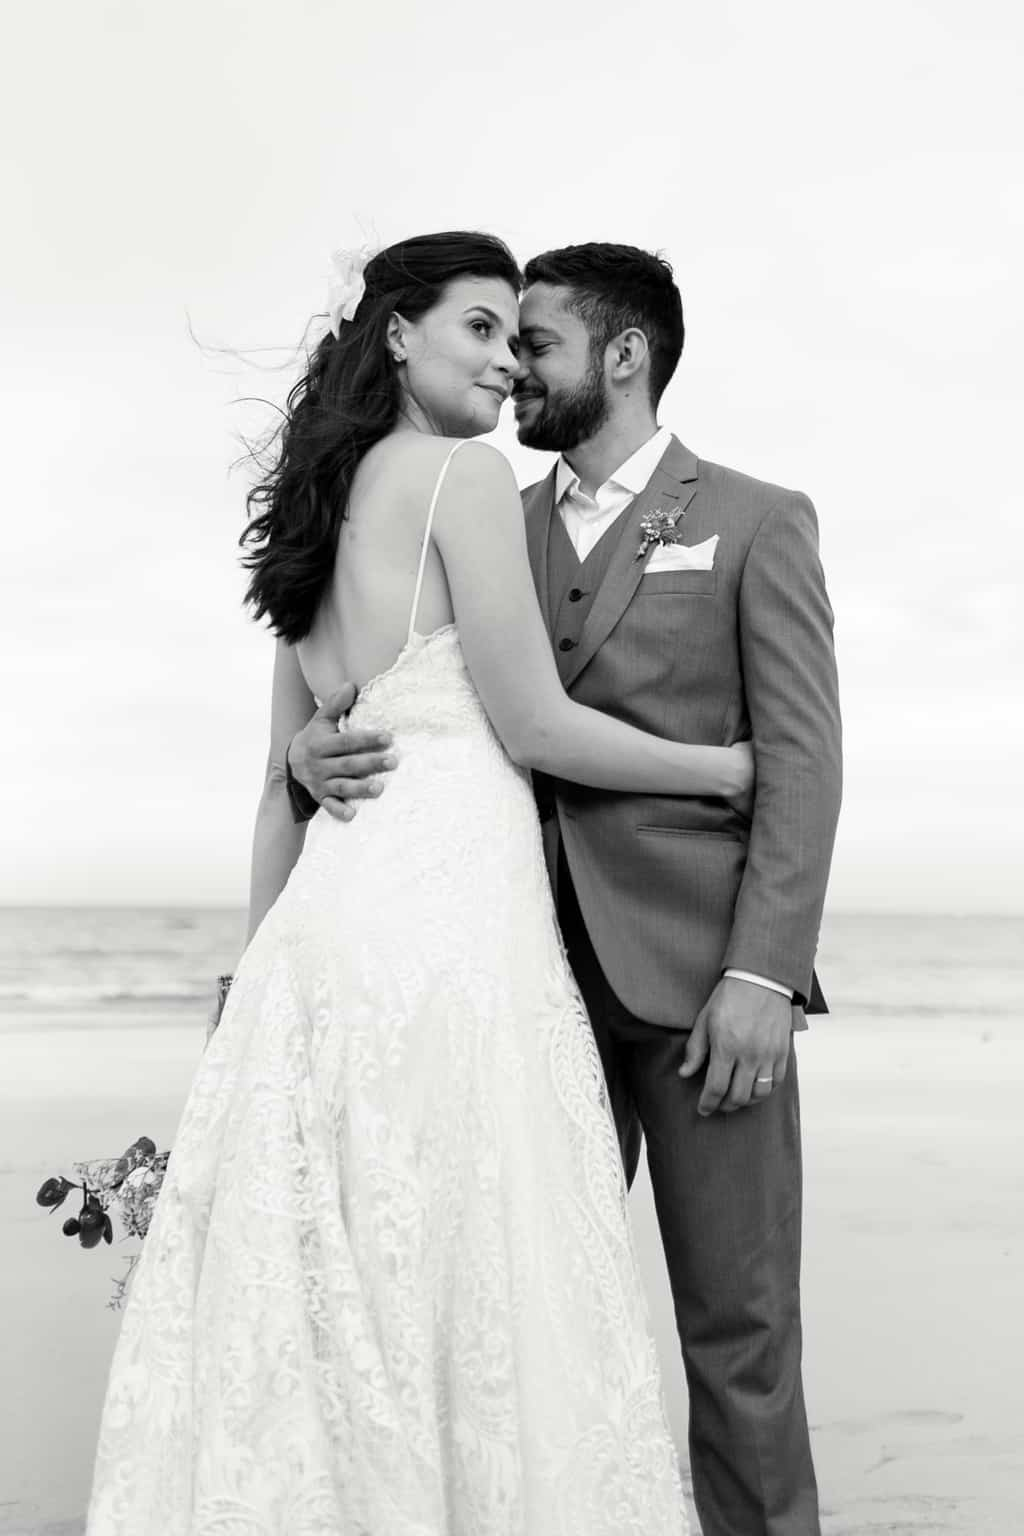 Casamento-Emanuelle-e-Alysson-Fotografia-Tadeu-Nanó-e-Luca-Antunes136